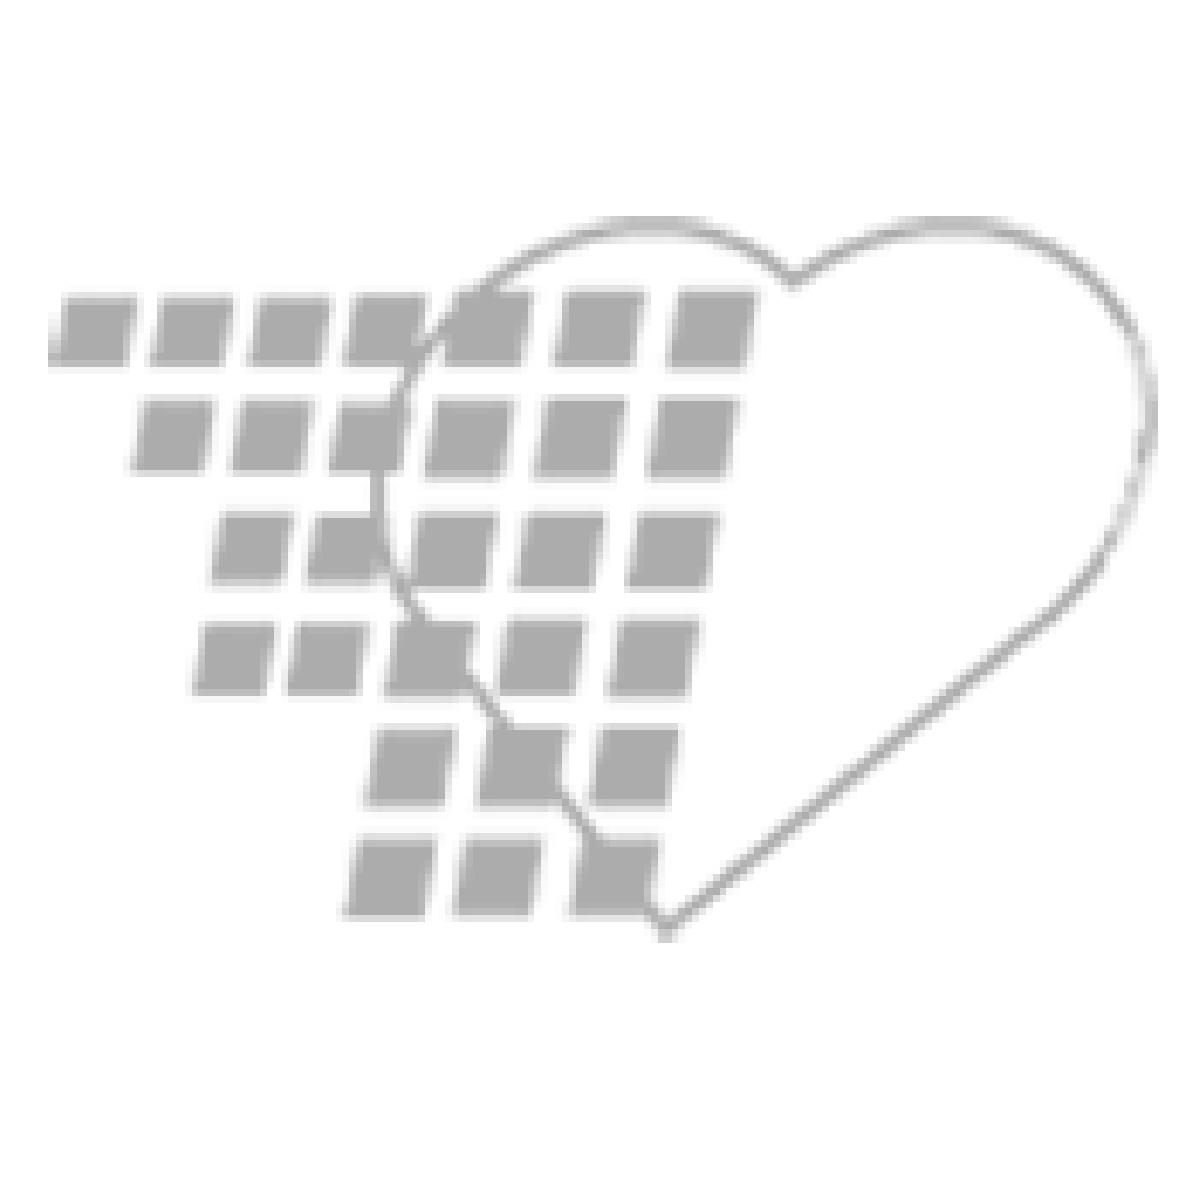 07-71-4614 Laerdal Face Shield CPR Barrier Refill